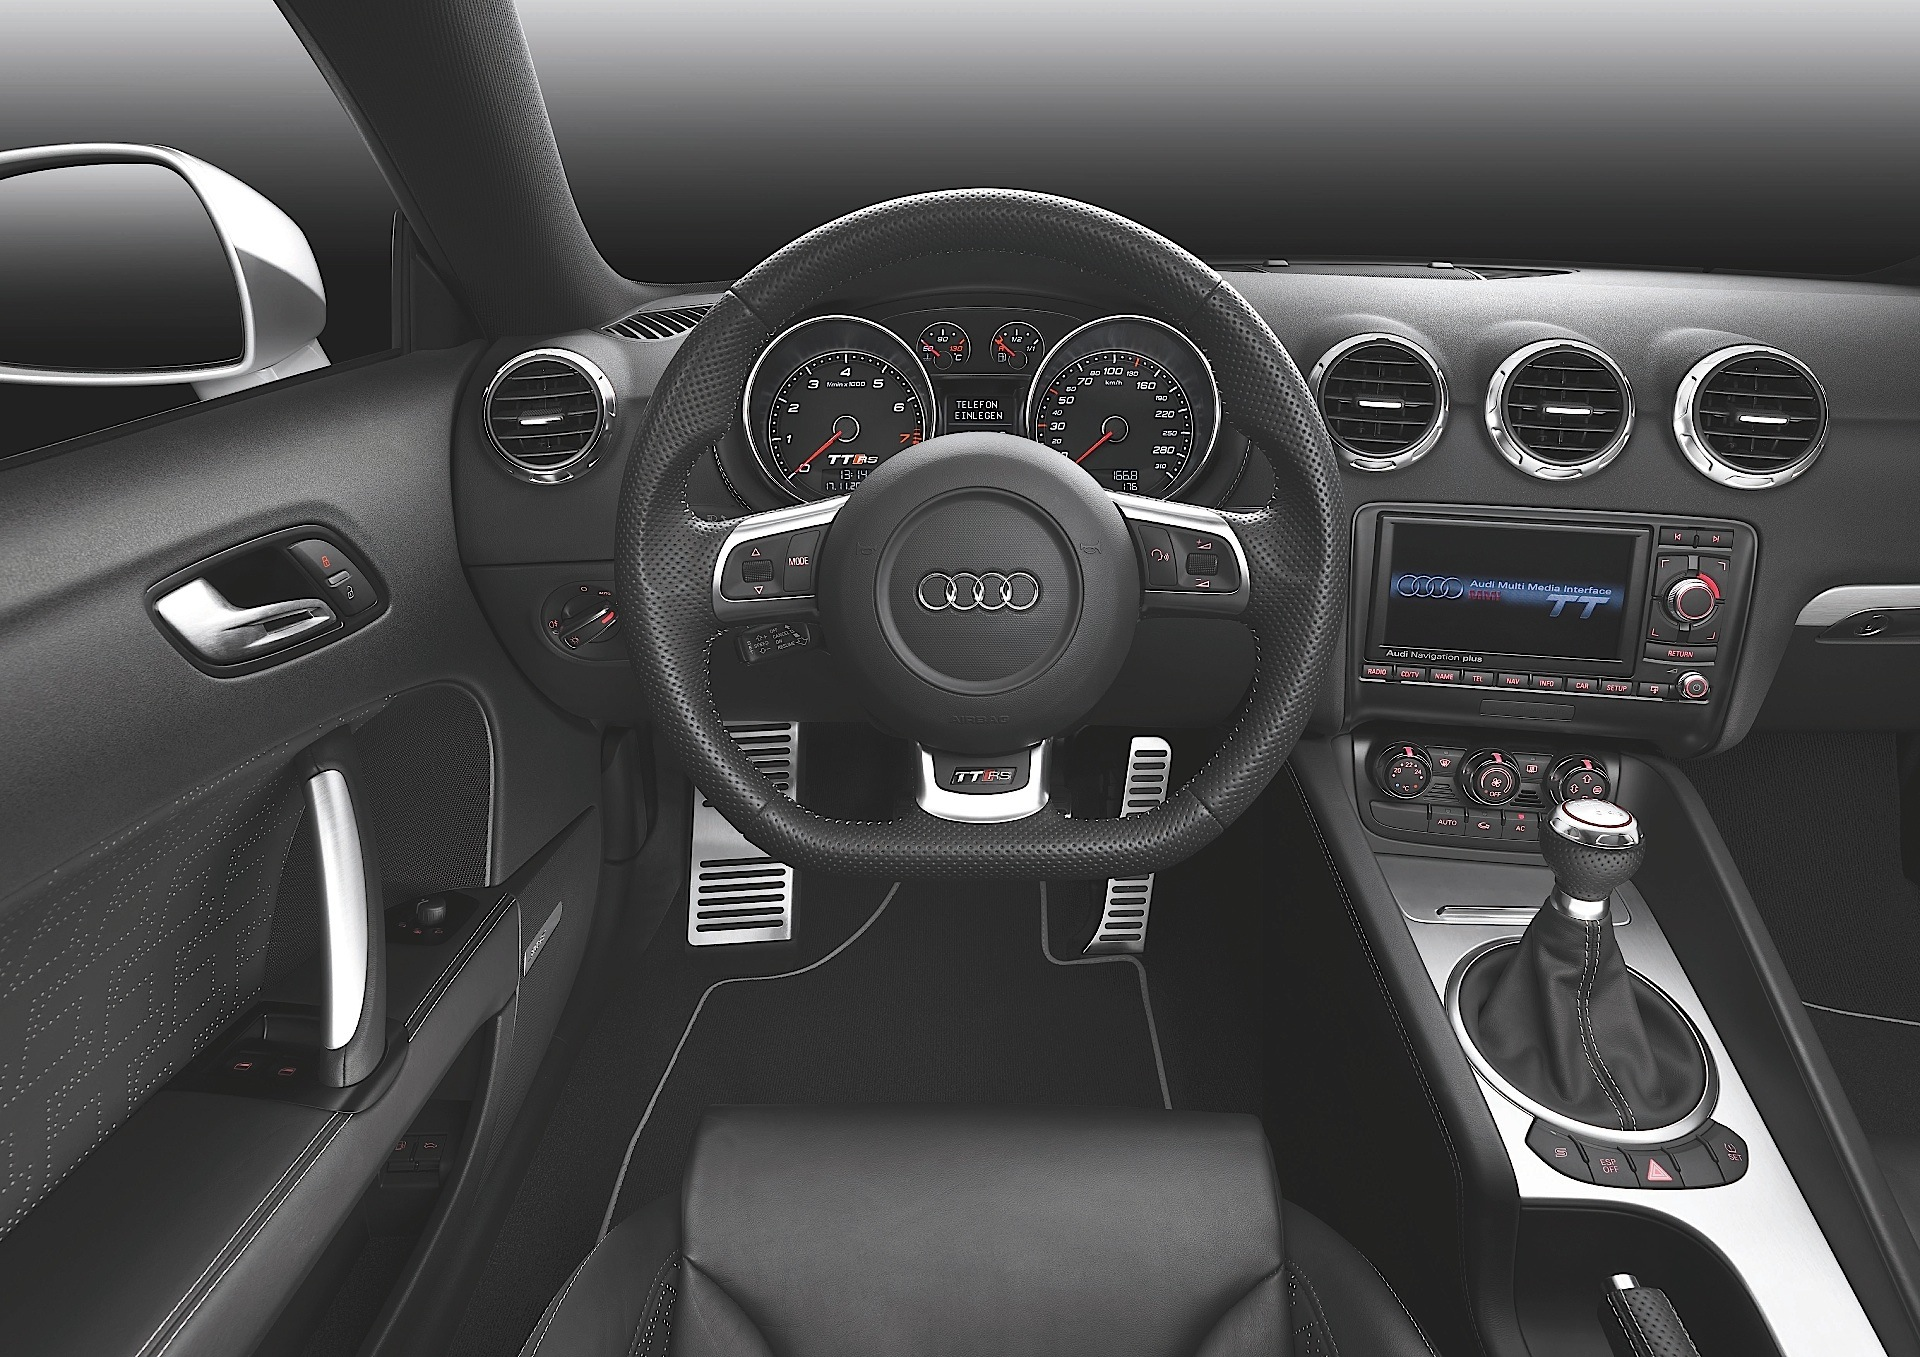 audi tt rs coupe specs 2009 2010 2011 2012 2013 2014 rh autoevolution com 2009 audi tt manual for sale 2009 audi tt manual transmission